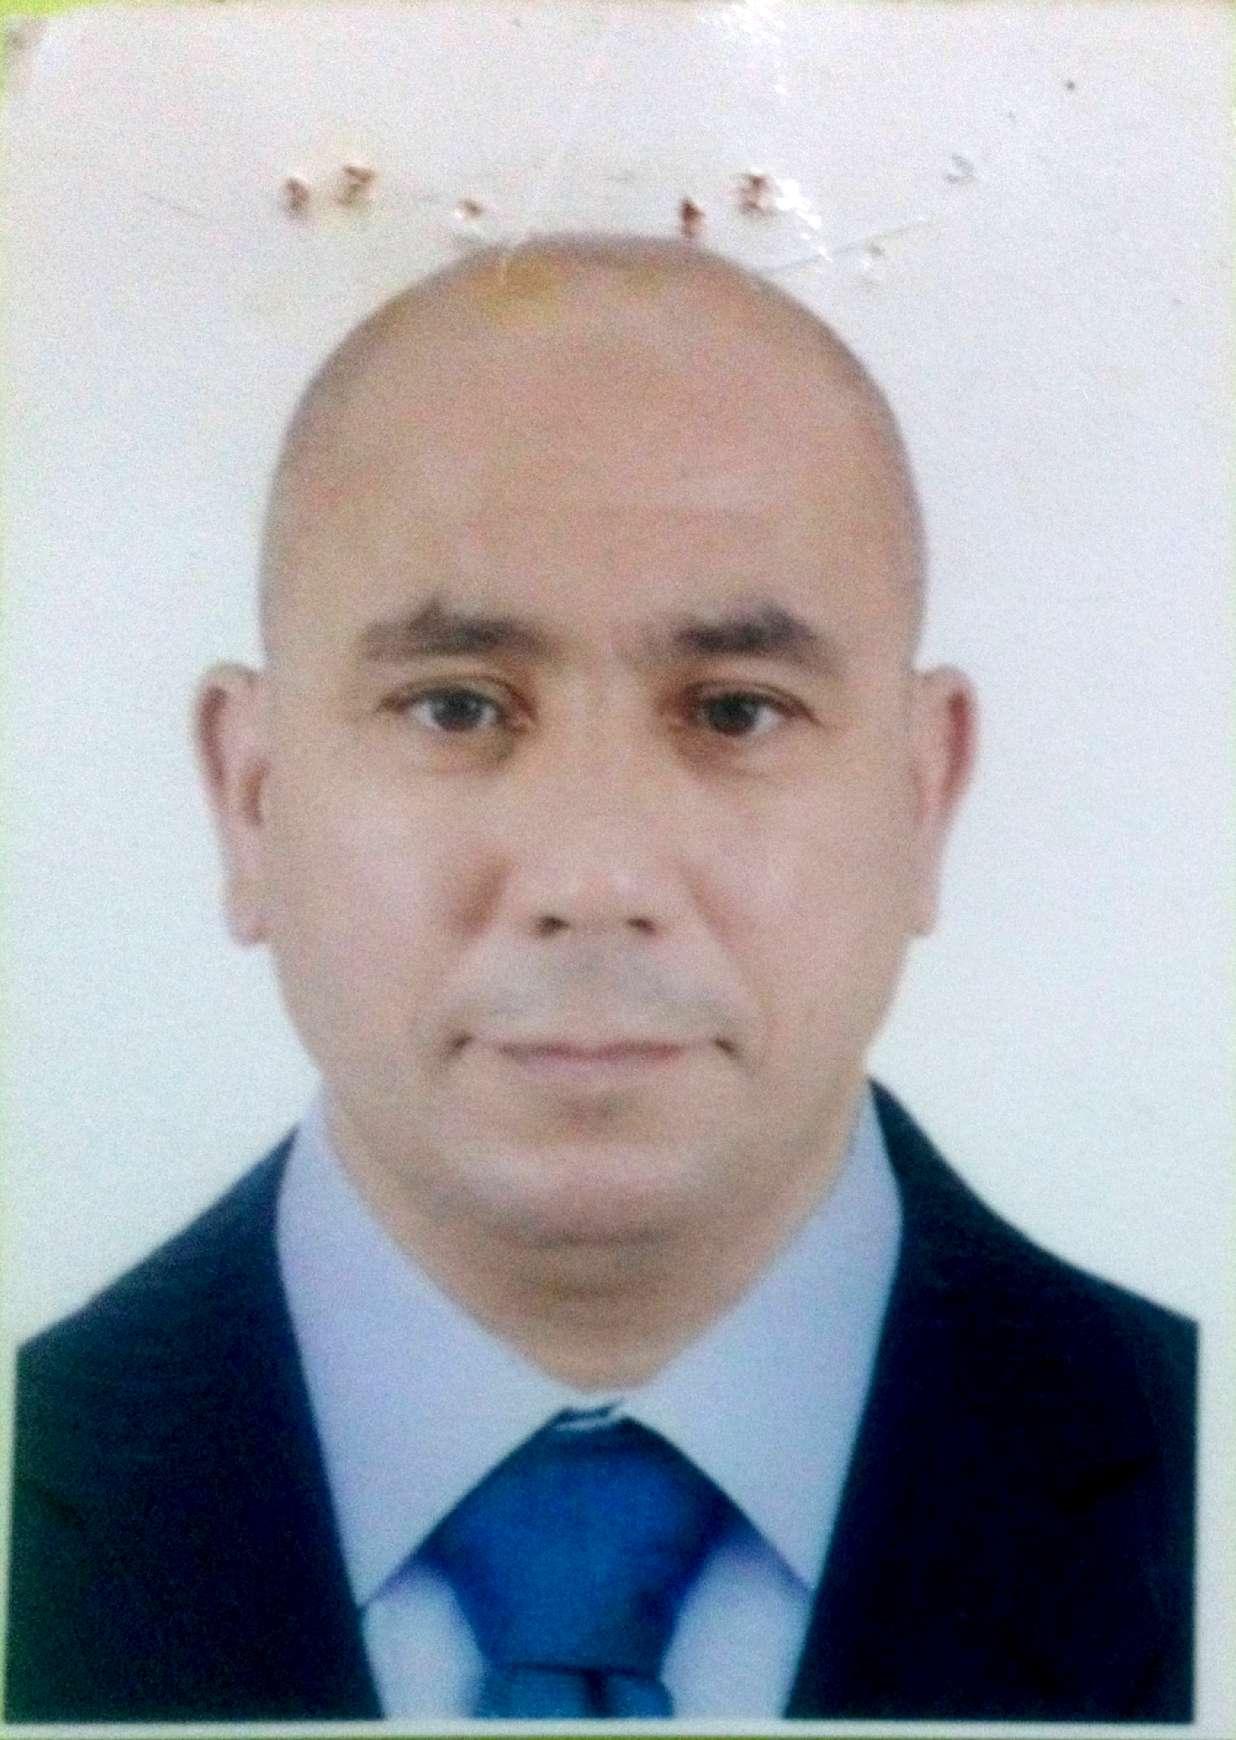 Abdellaziz MOHAMED NACER